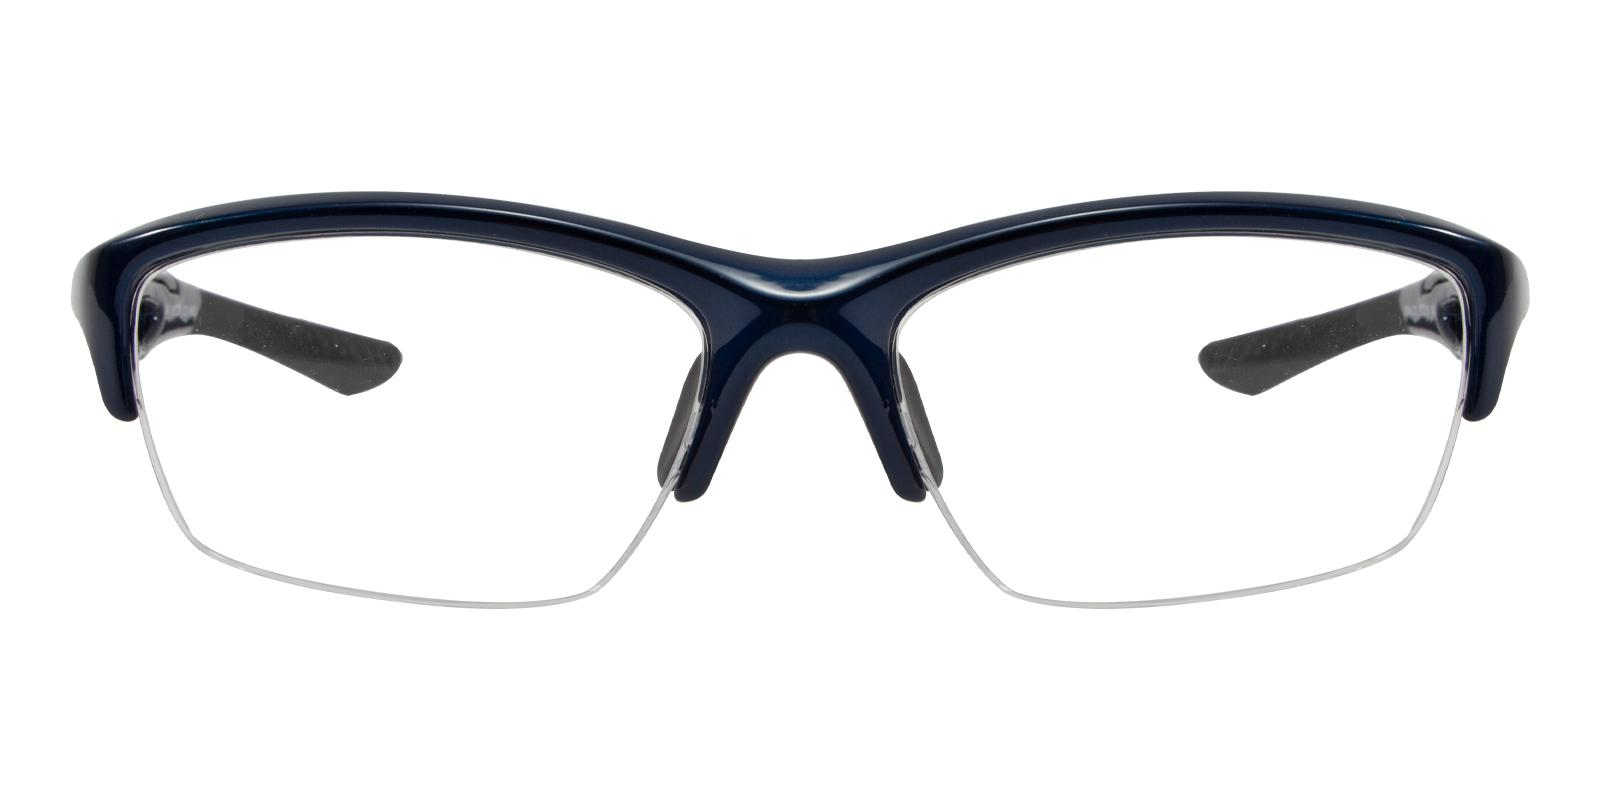 Phobos Multicolor TR NosePads , SportsGlasses Frames from ABBE Glasses